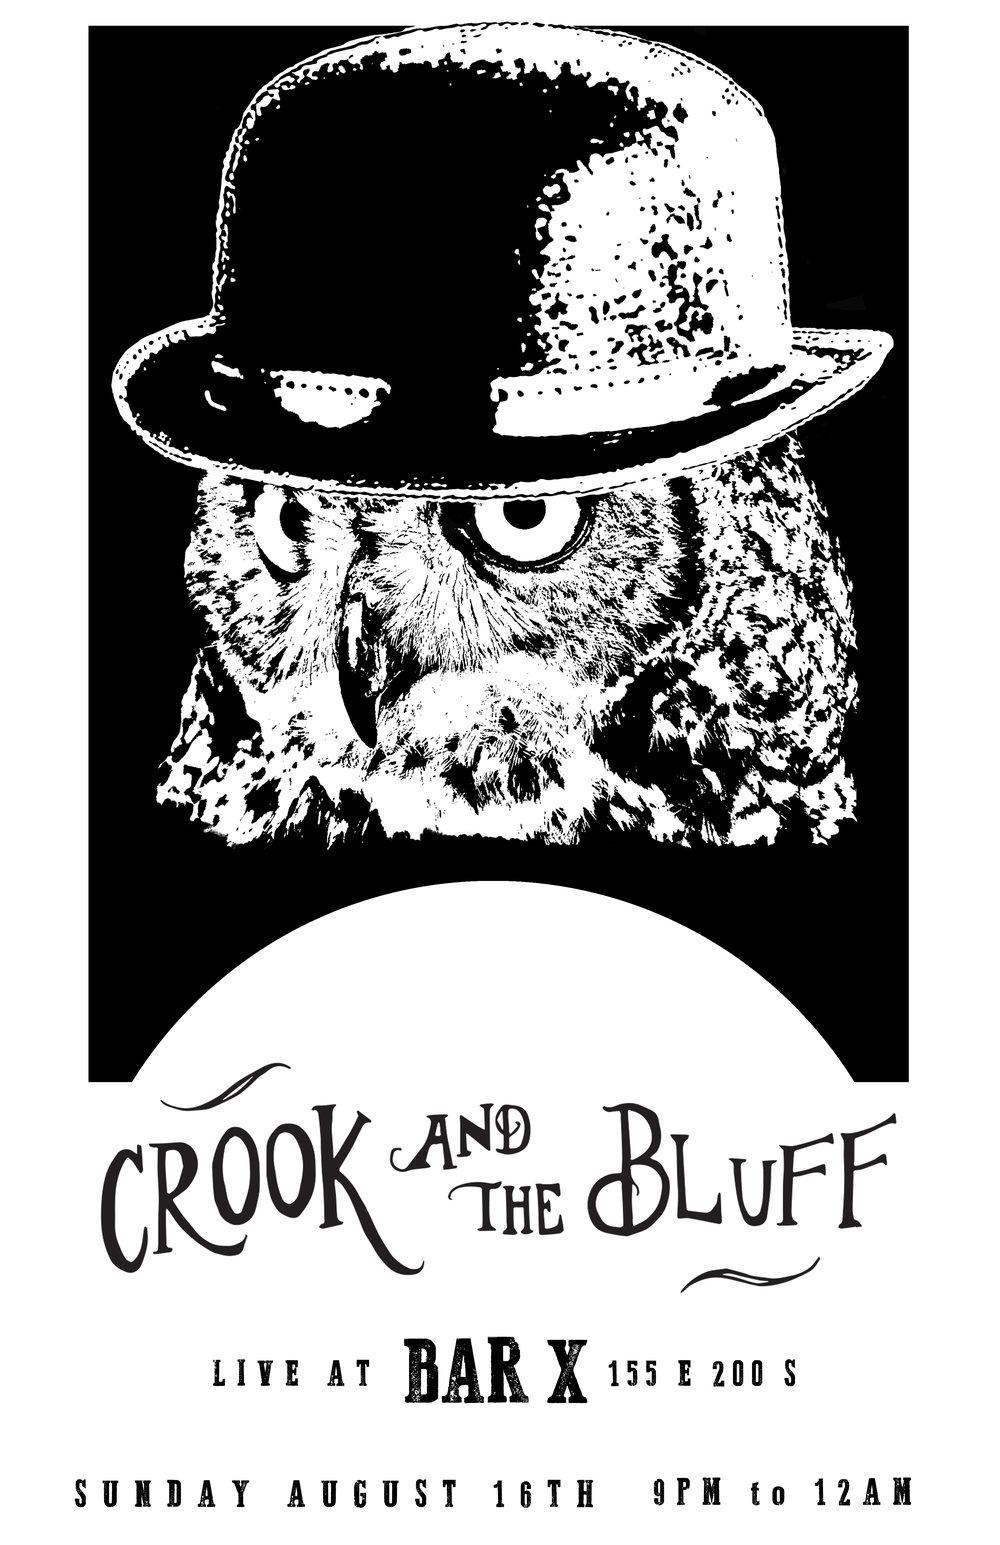 CrookBARX.jpg